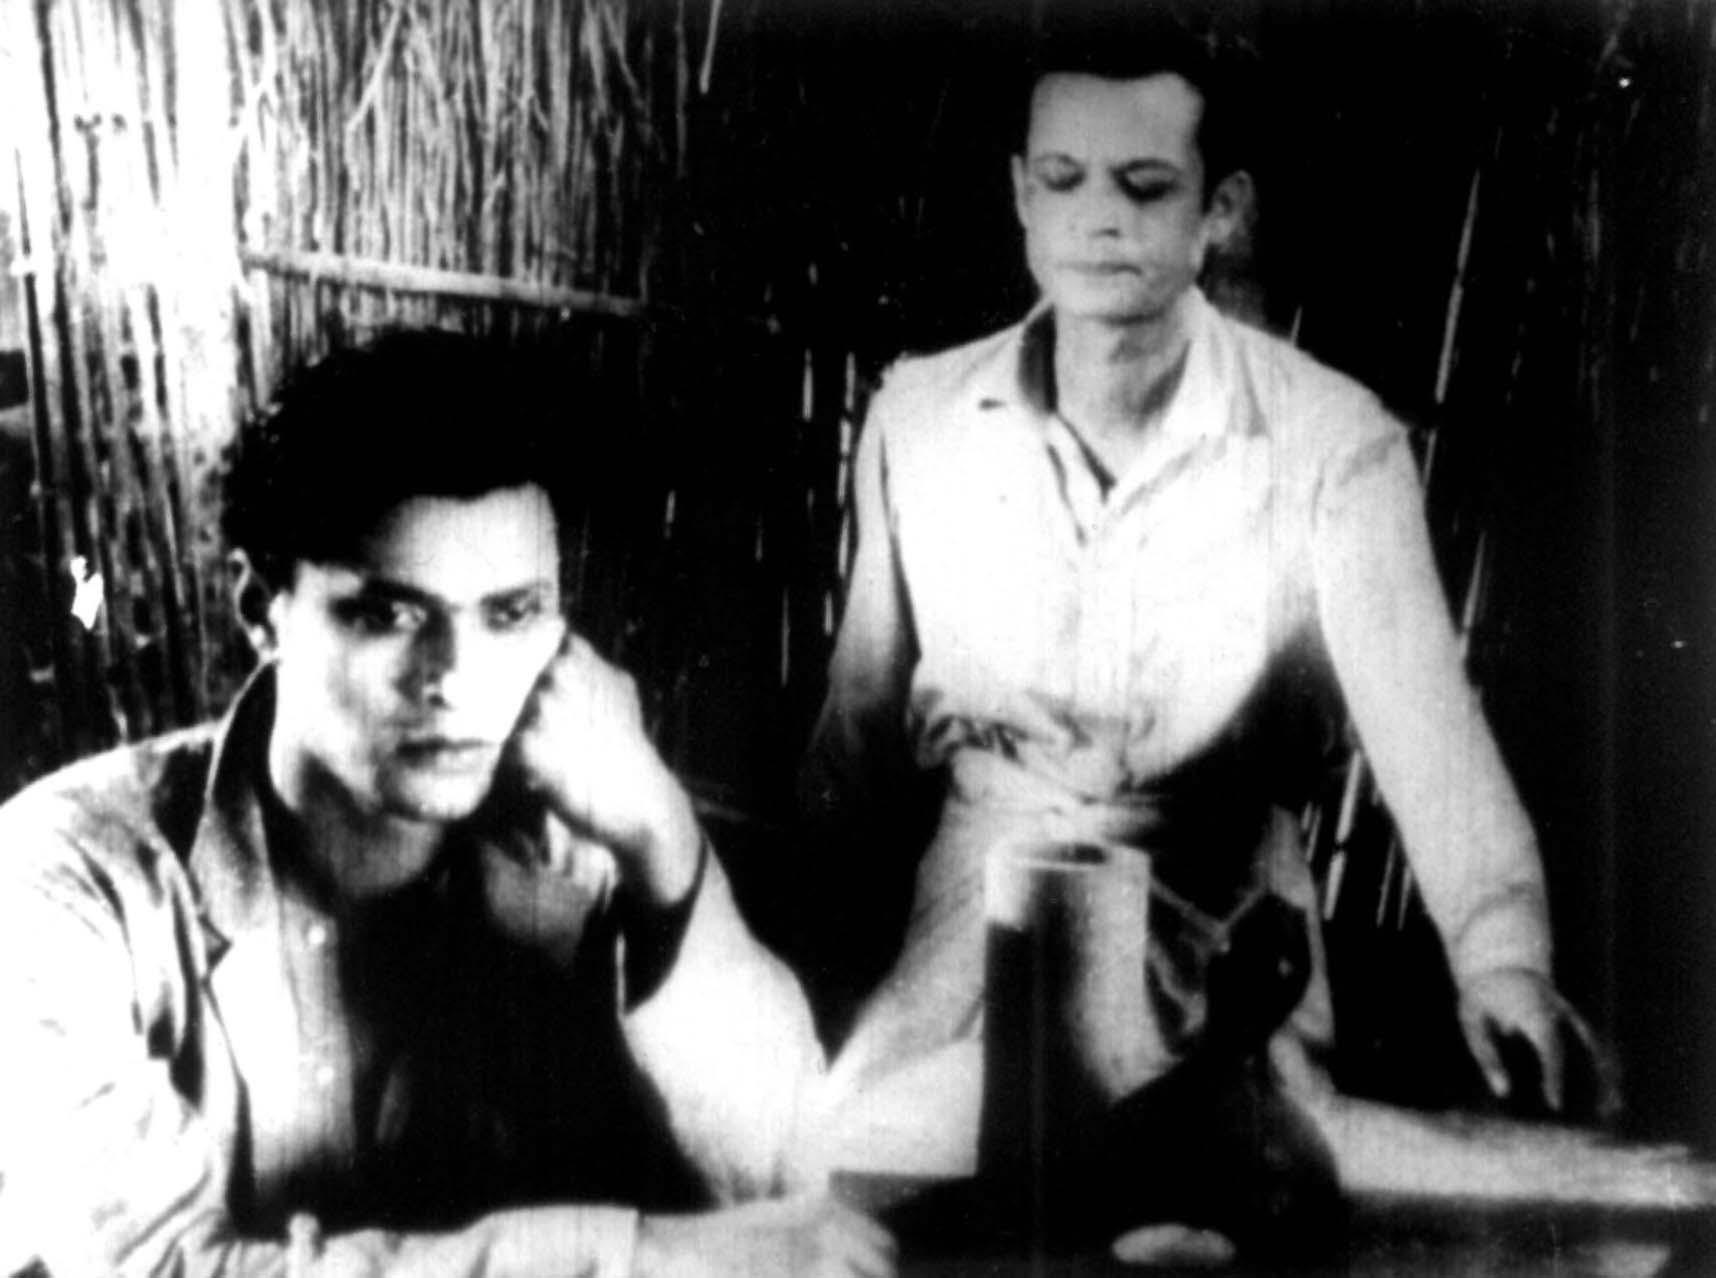 Pankaj Mullick in the 1937 film, Mukti, with Pramathesh Barua